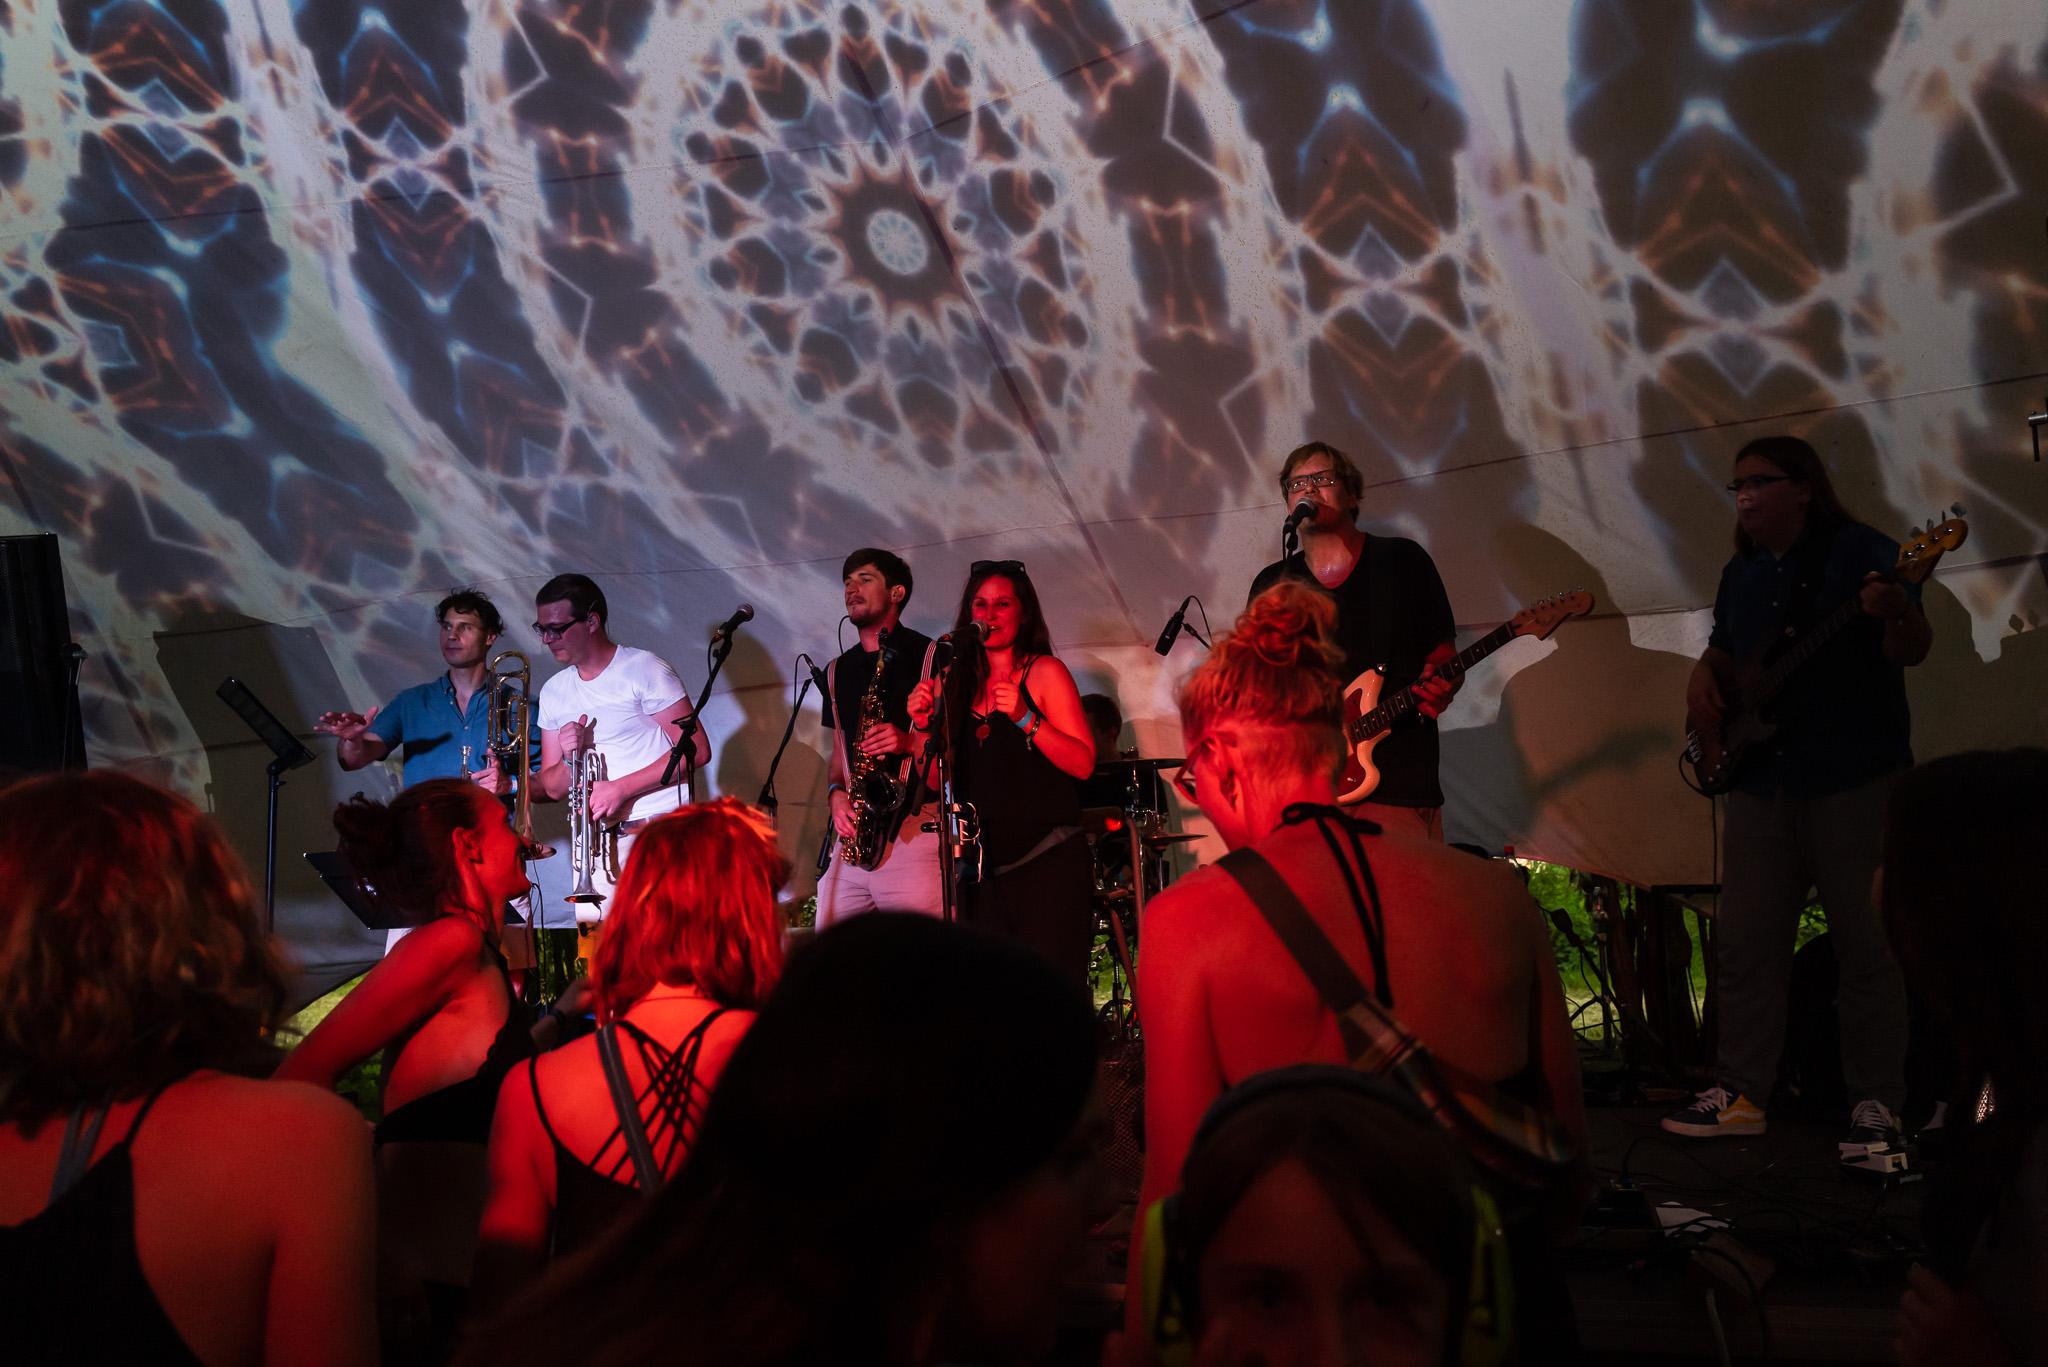 Skavida auf der Buehne - komplette Band